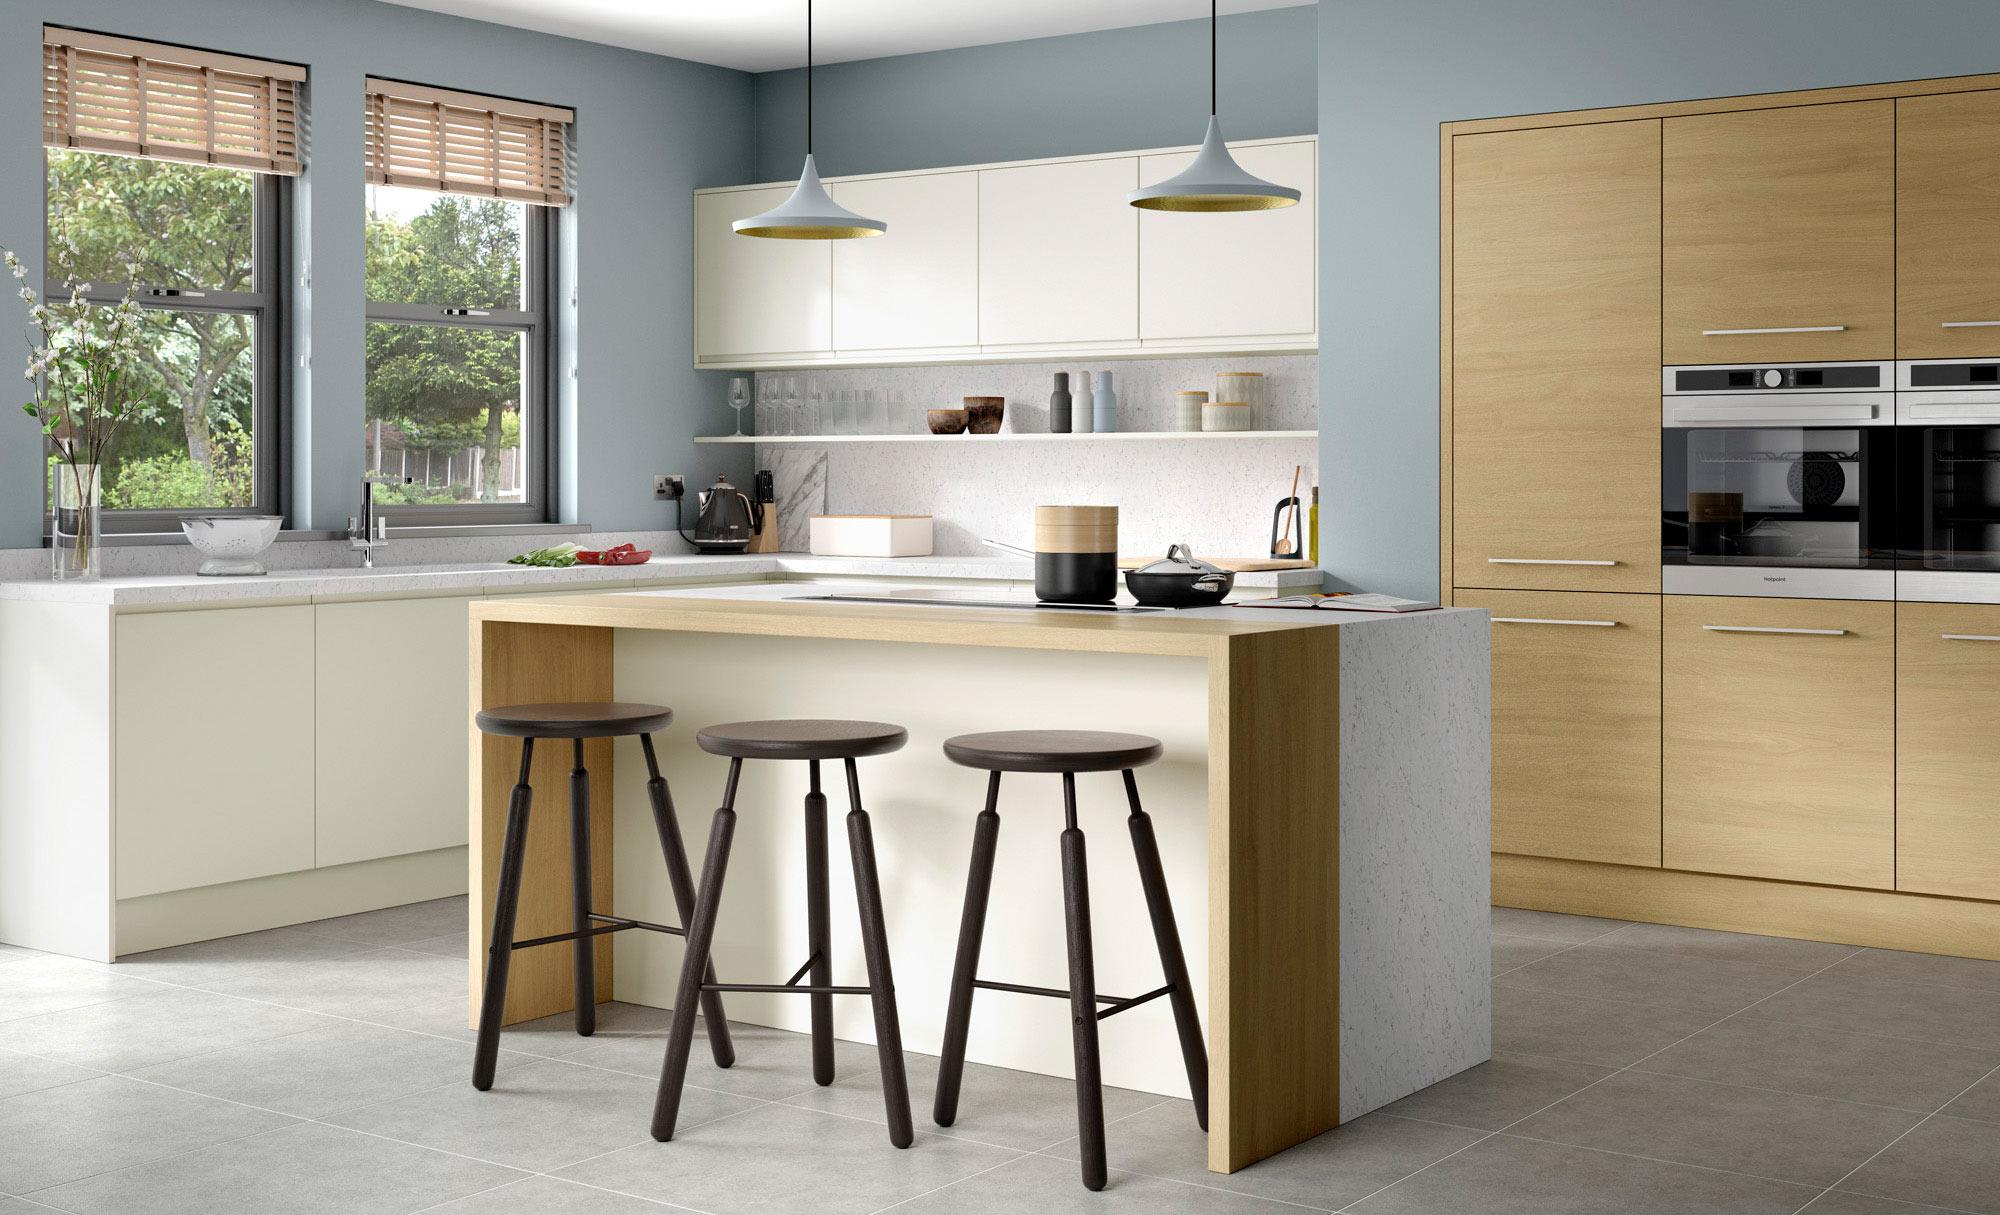 Uform Strada Matte Porcelain & Tavola Light Oak  Kitchen